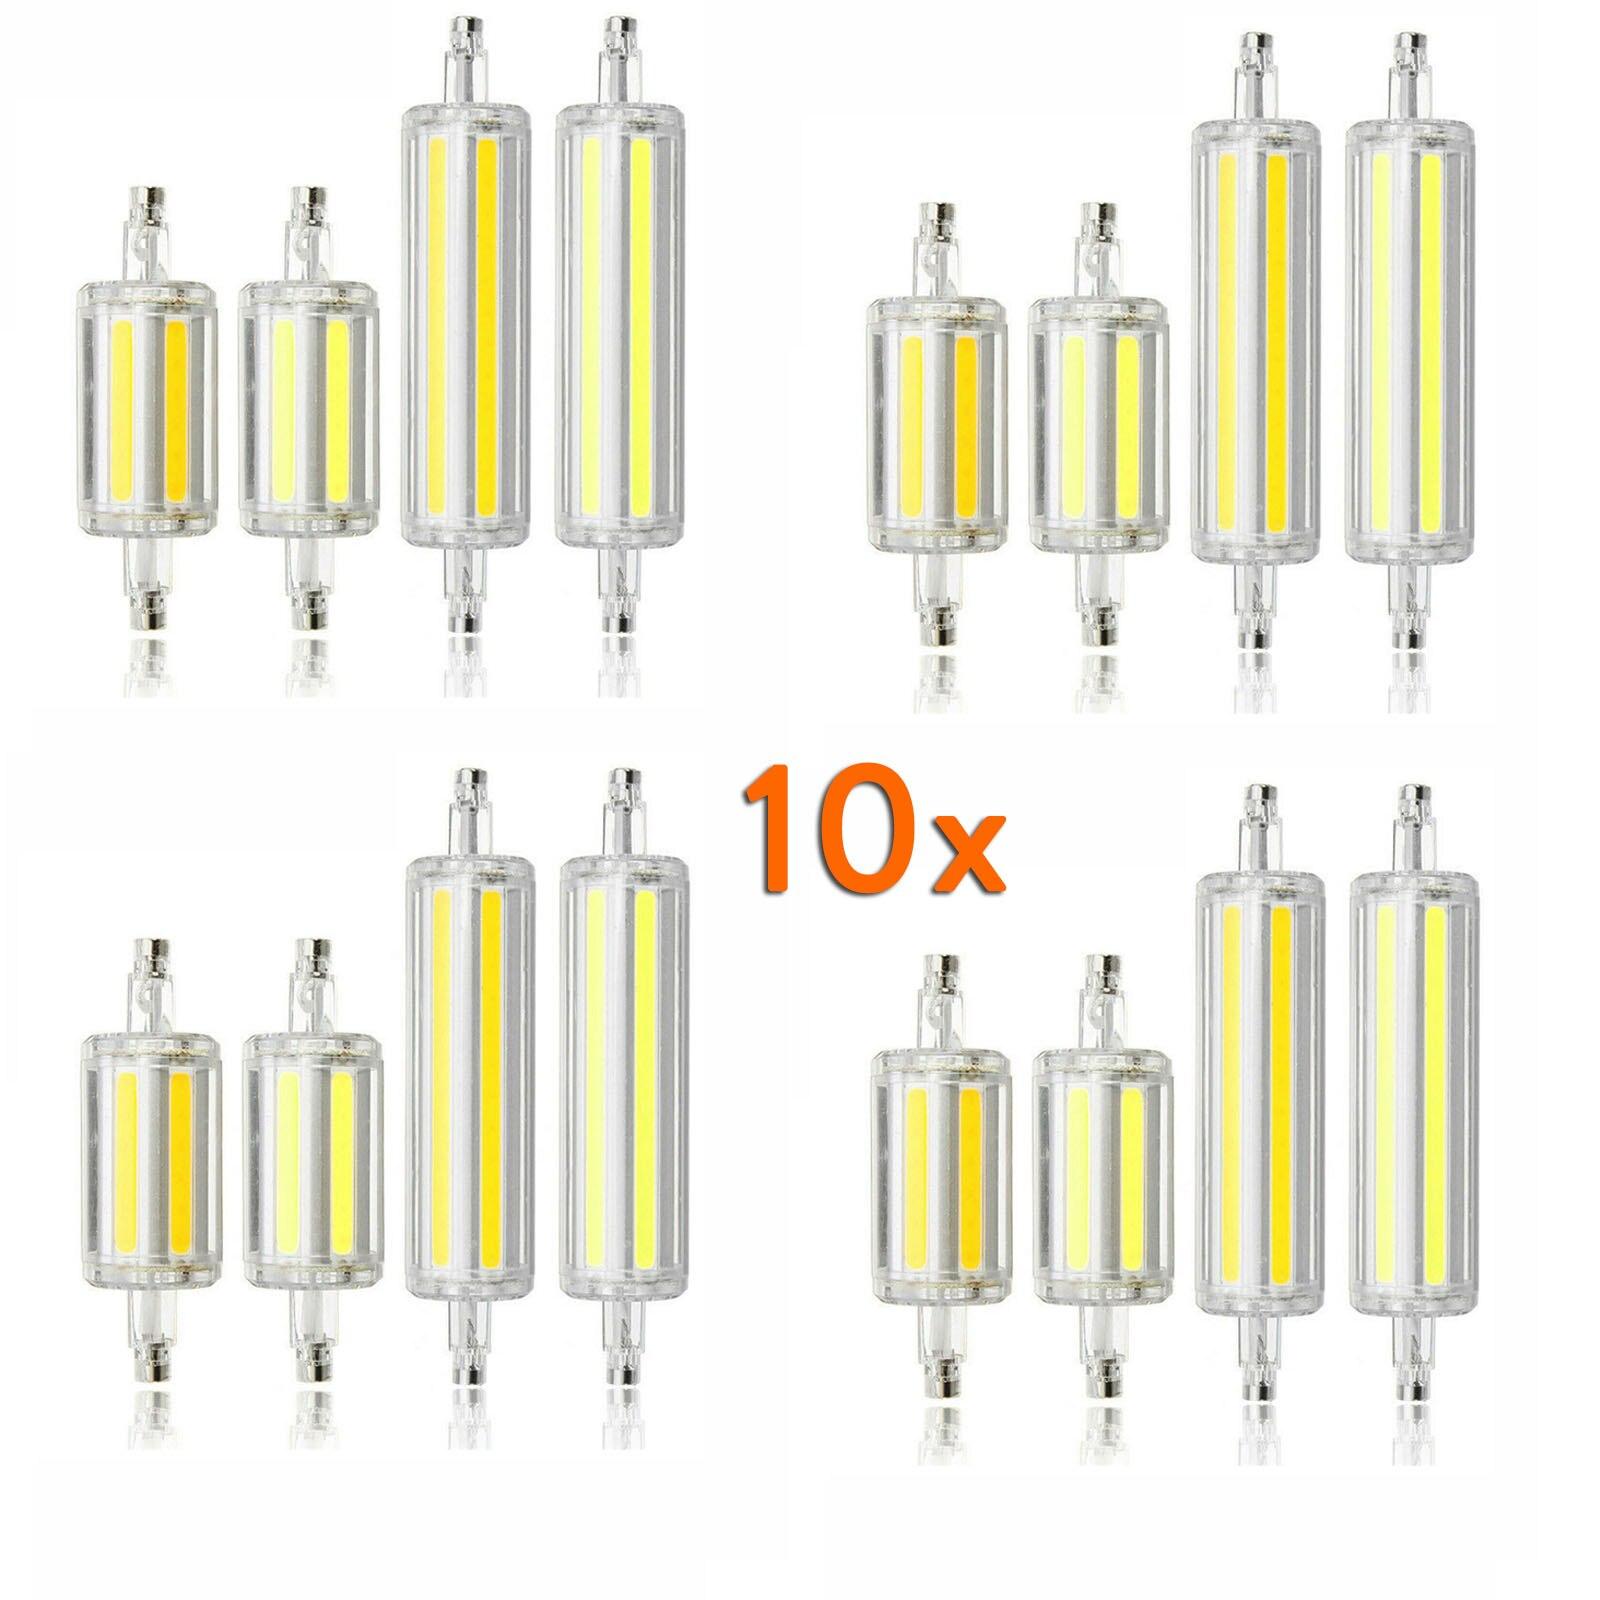 10x New Ampoule R7S LED Dimmable Flood Light J78 J118 78mm 118mm 10W 20W COB Spotlight Corn Bulb Lamp 110V 220V Bombillas Lamps